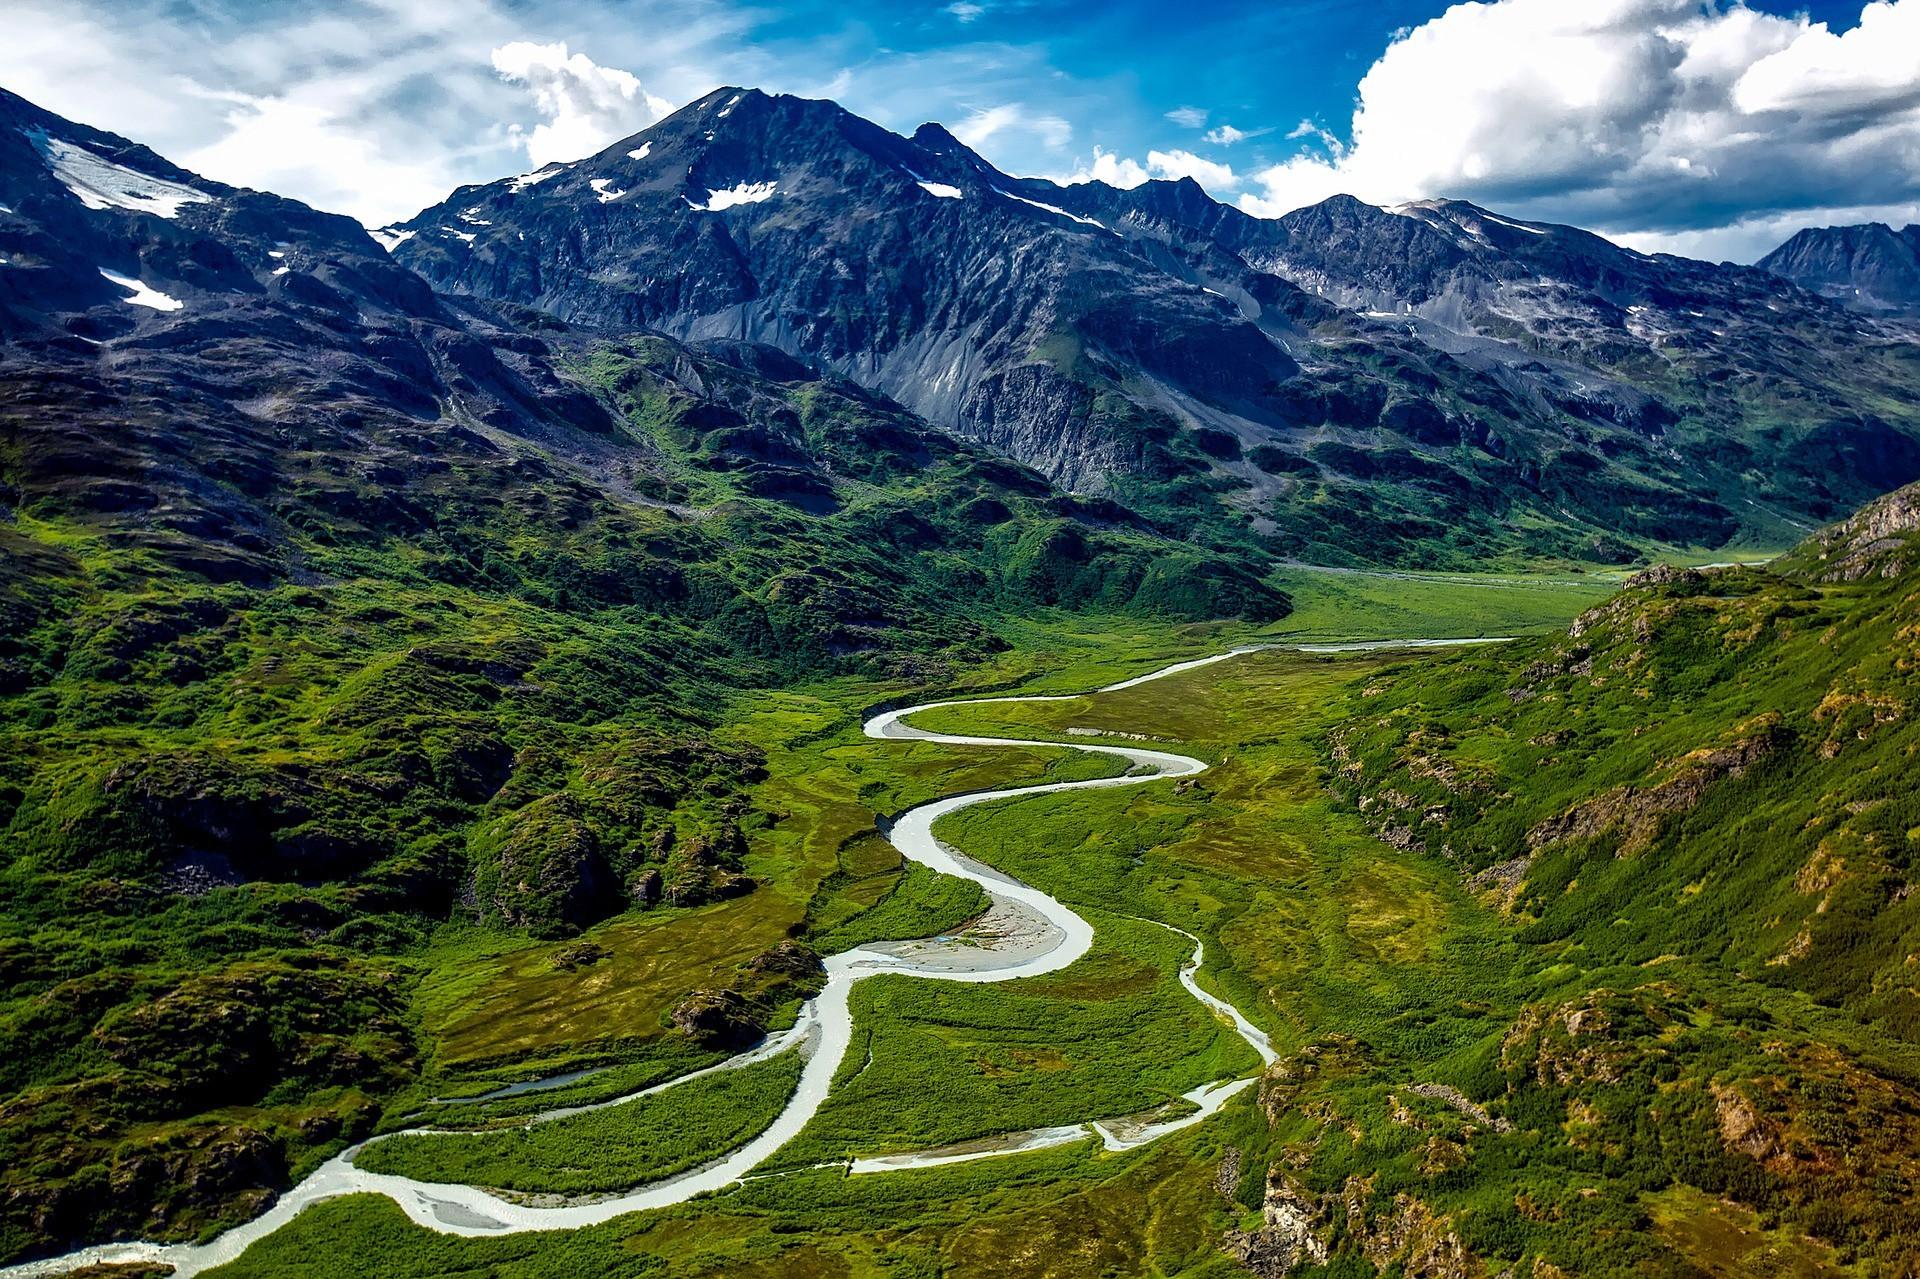 River between mountains in Alaska